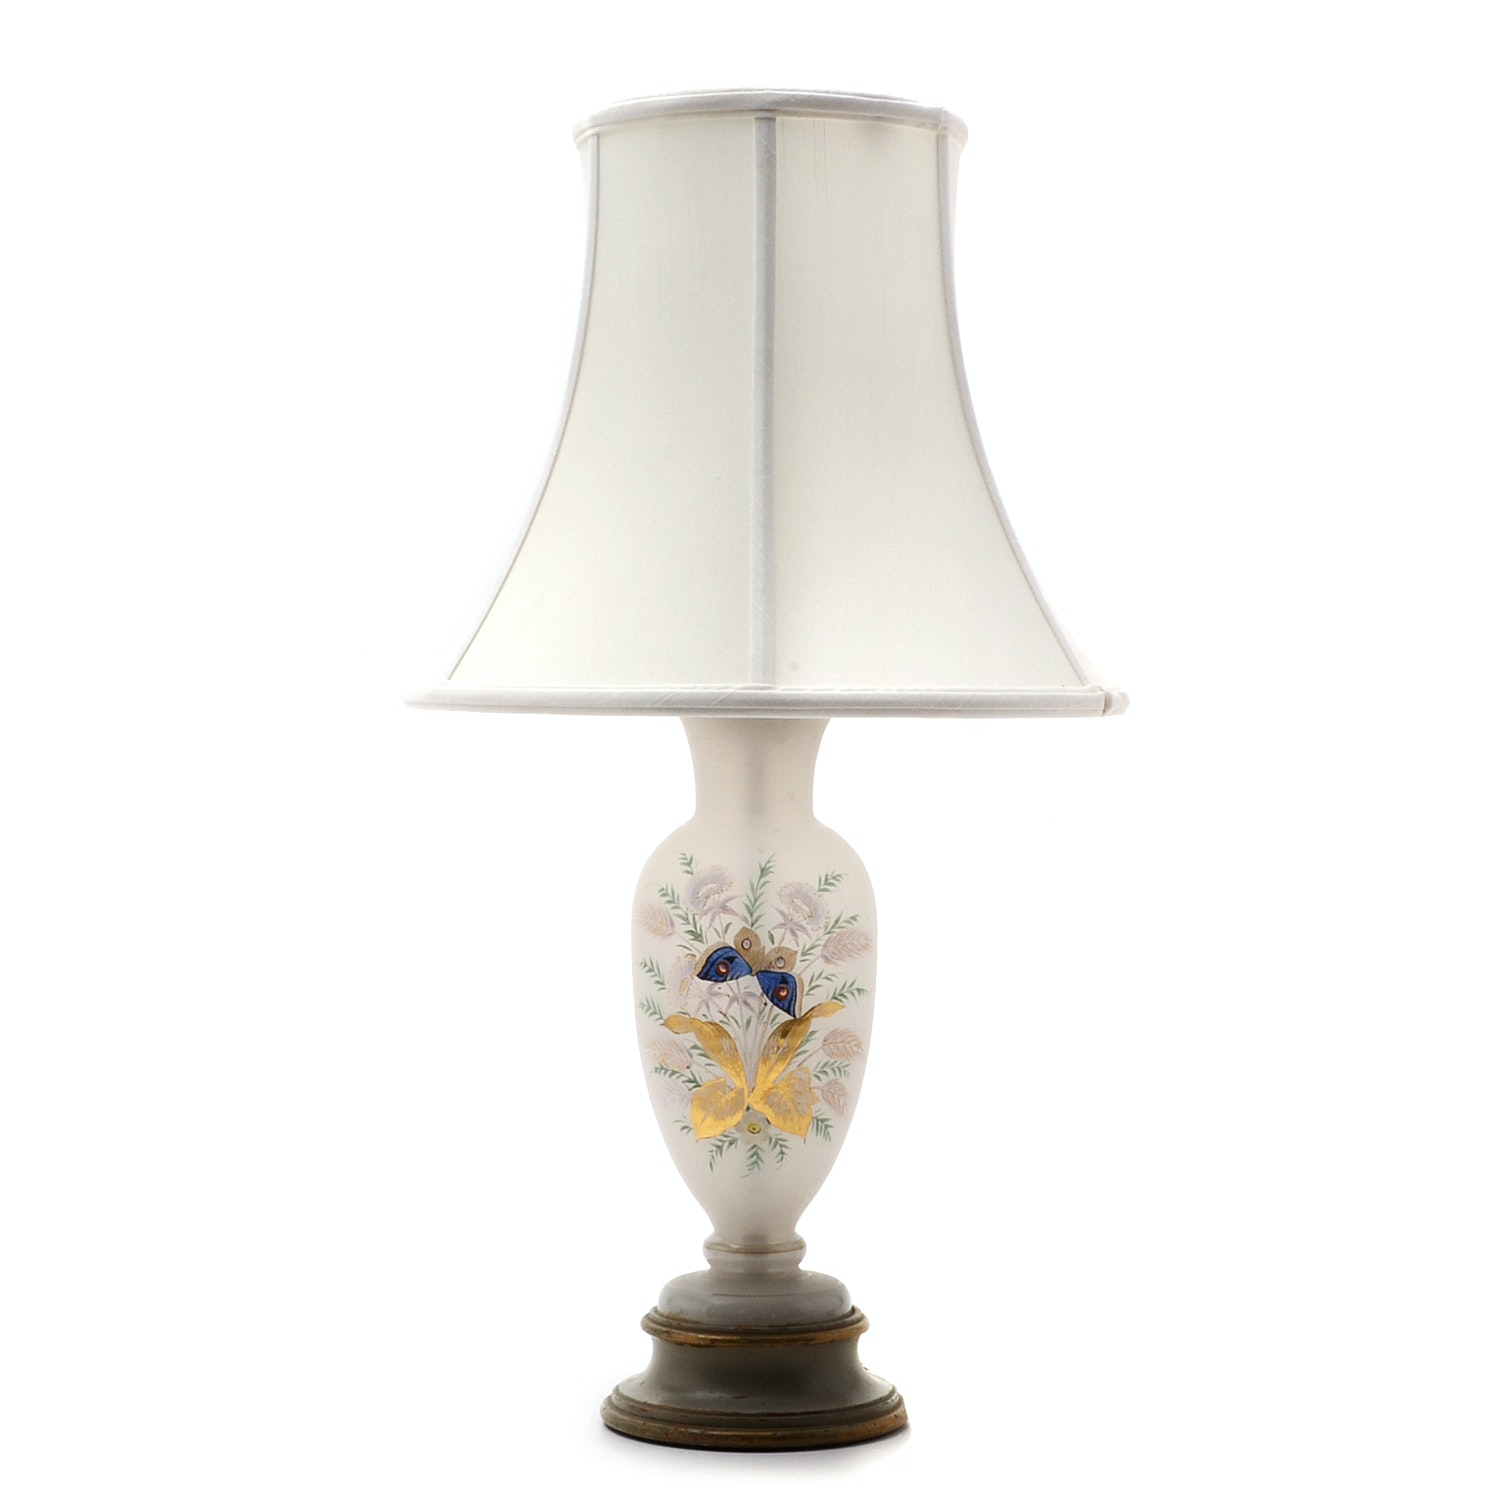 Victorian Bristol Glass Vase Lamp